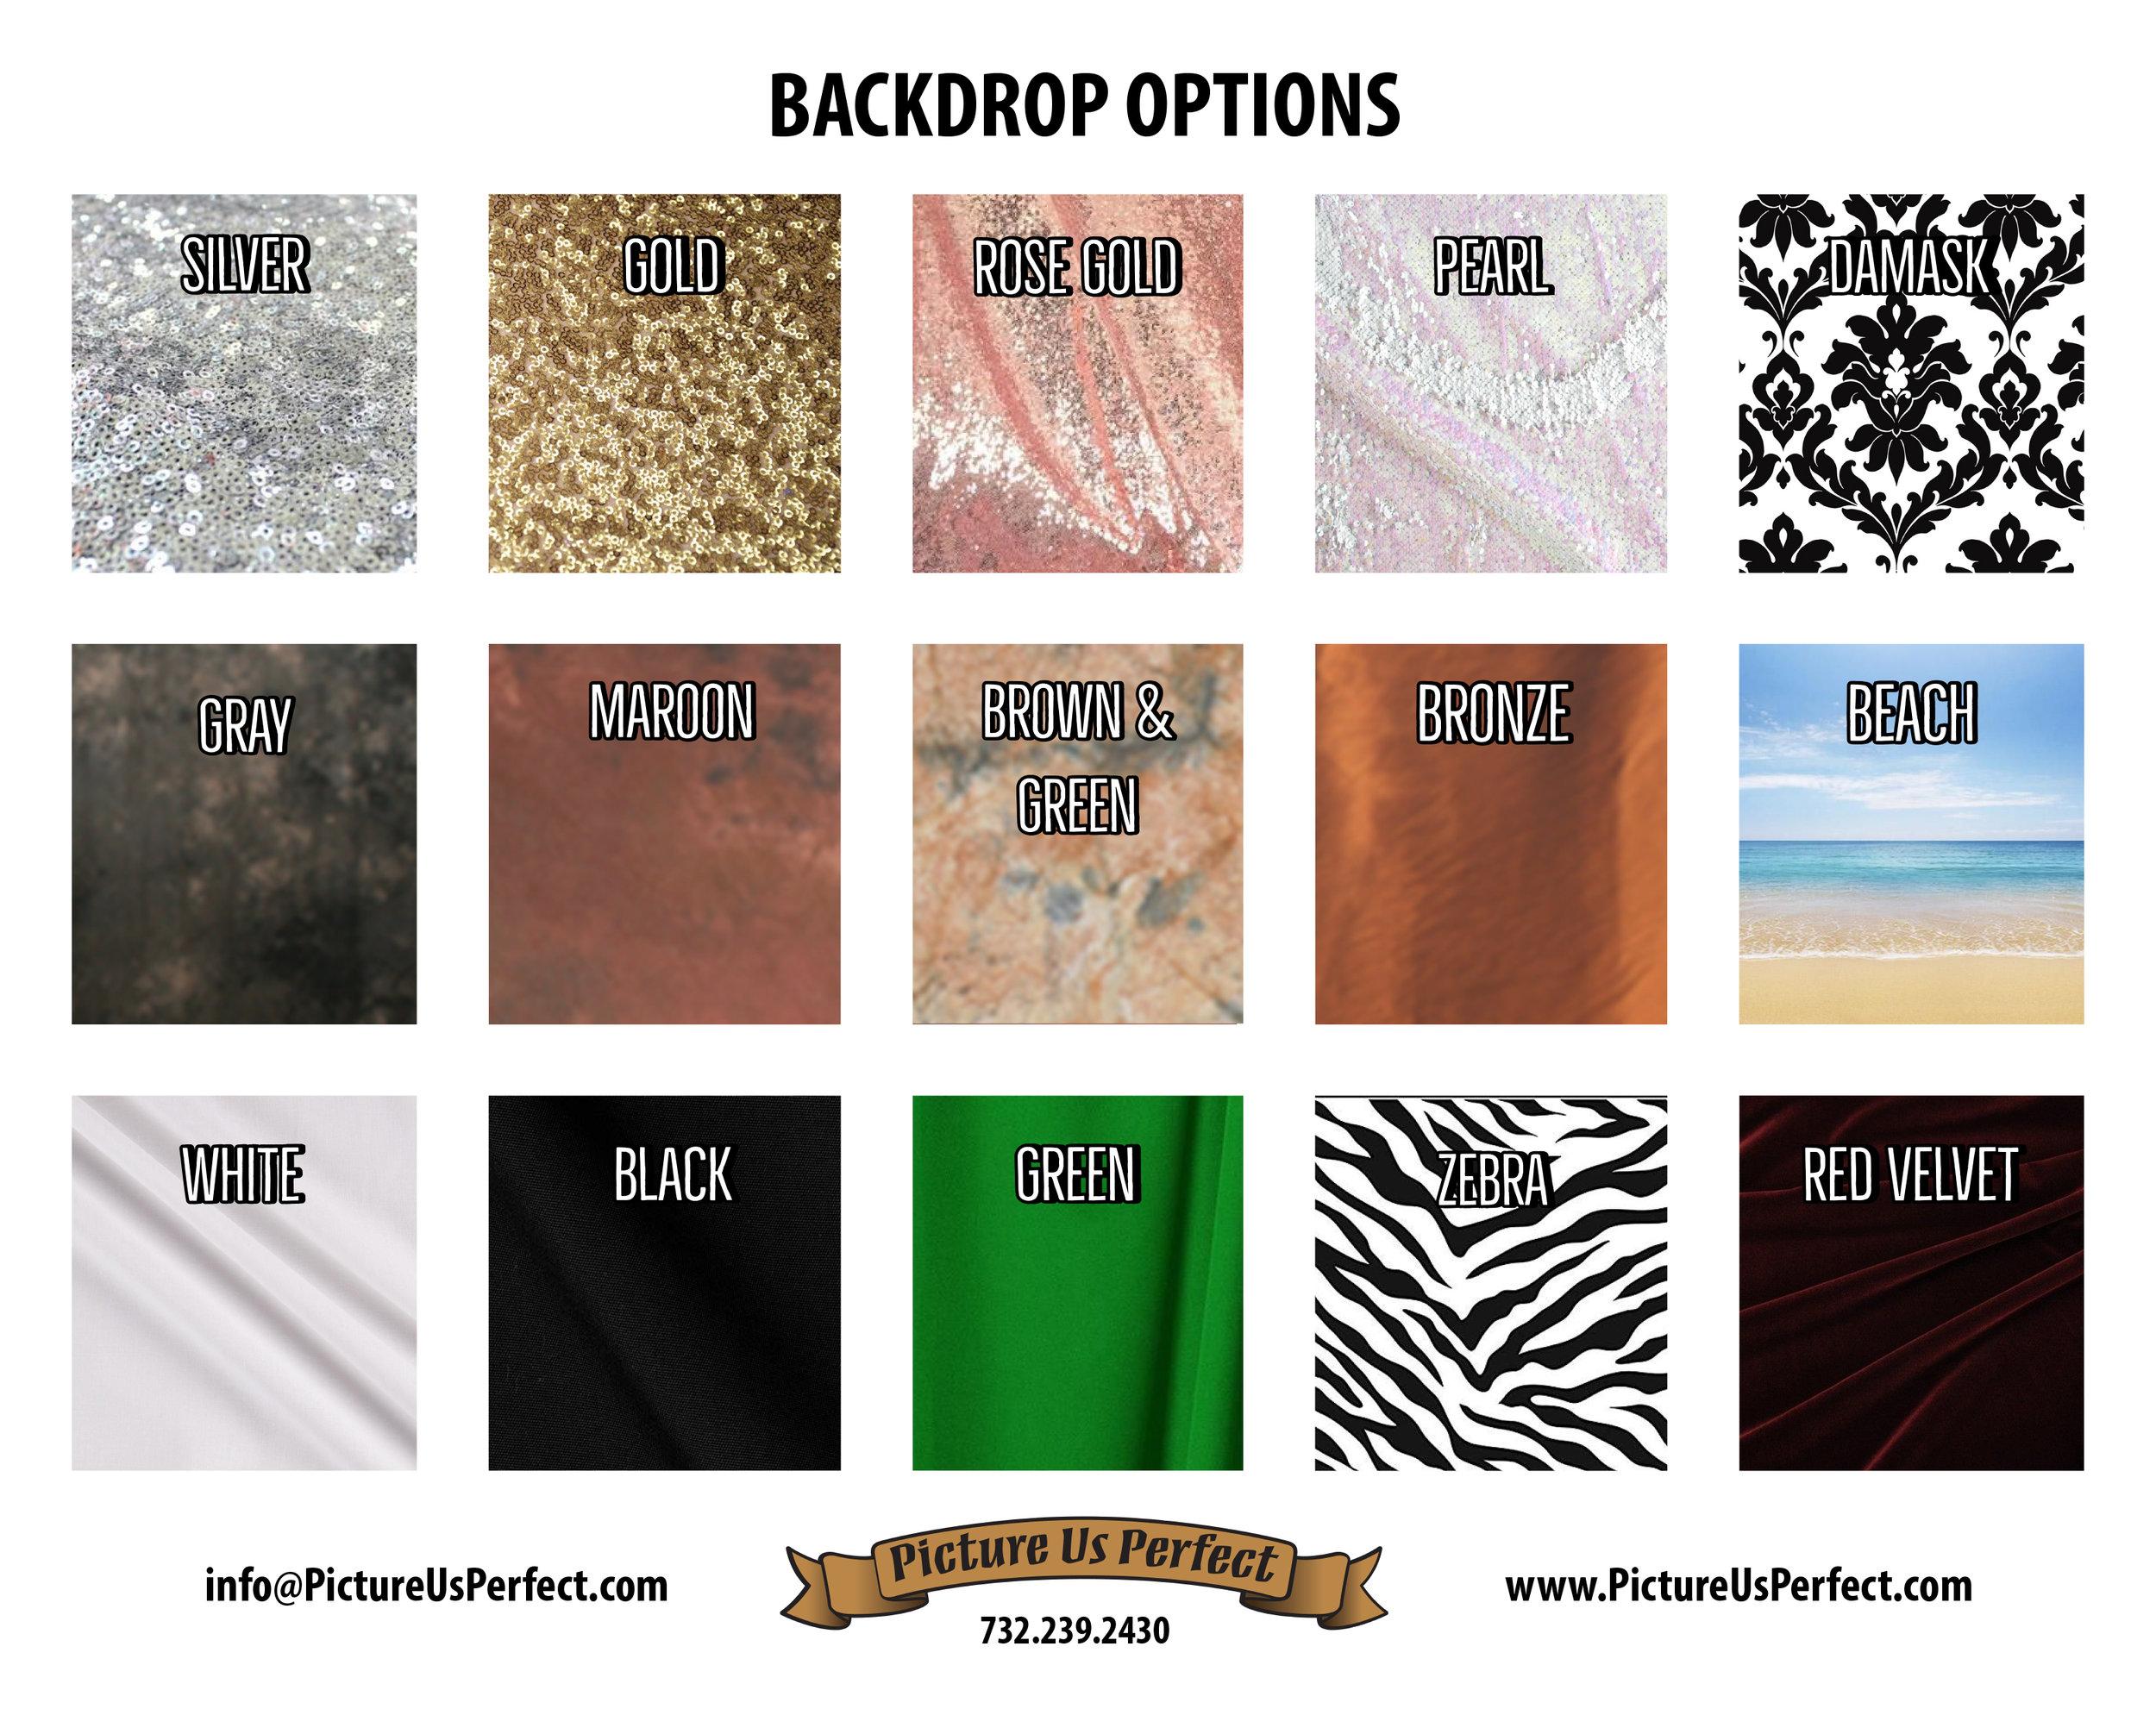 Backdrop Options 7.17.19.jpg